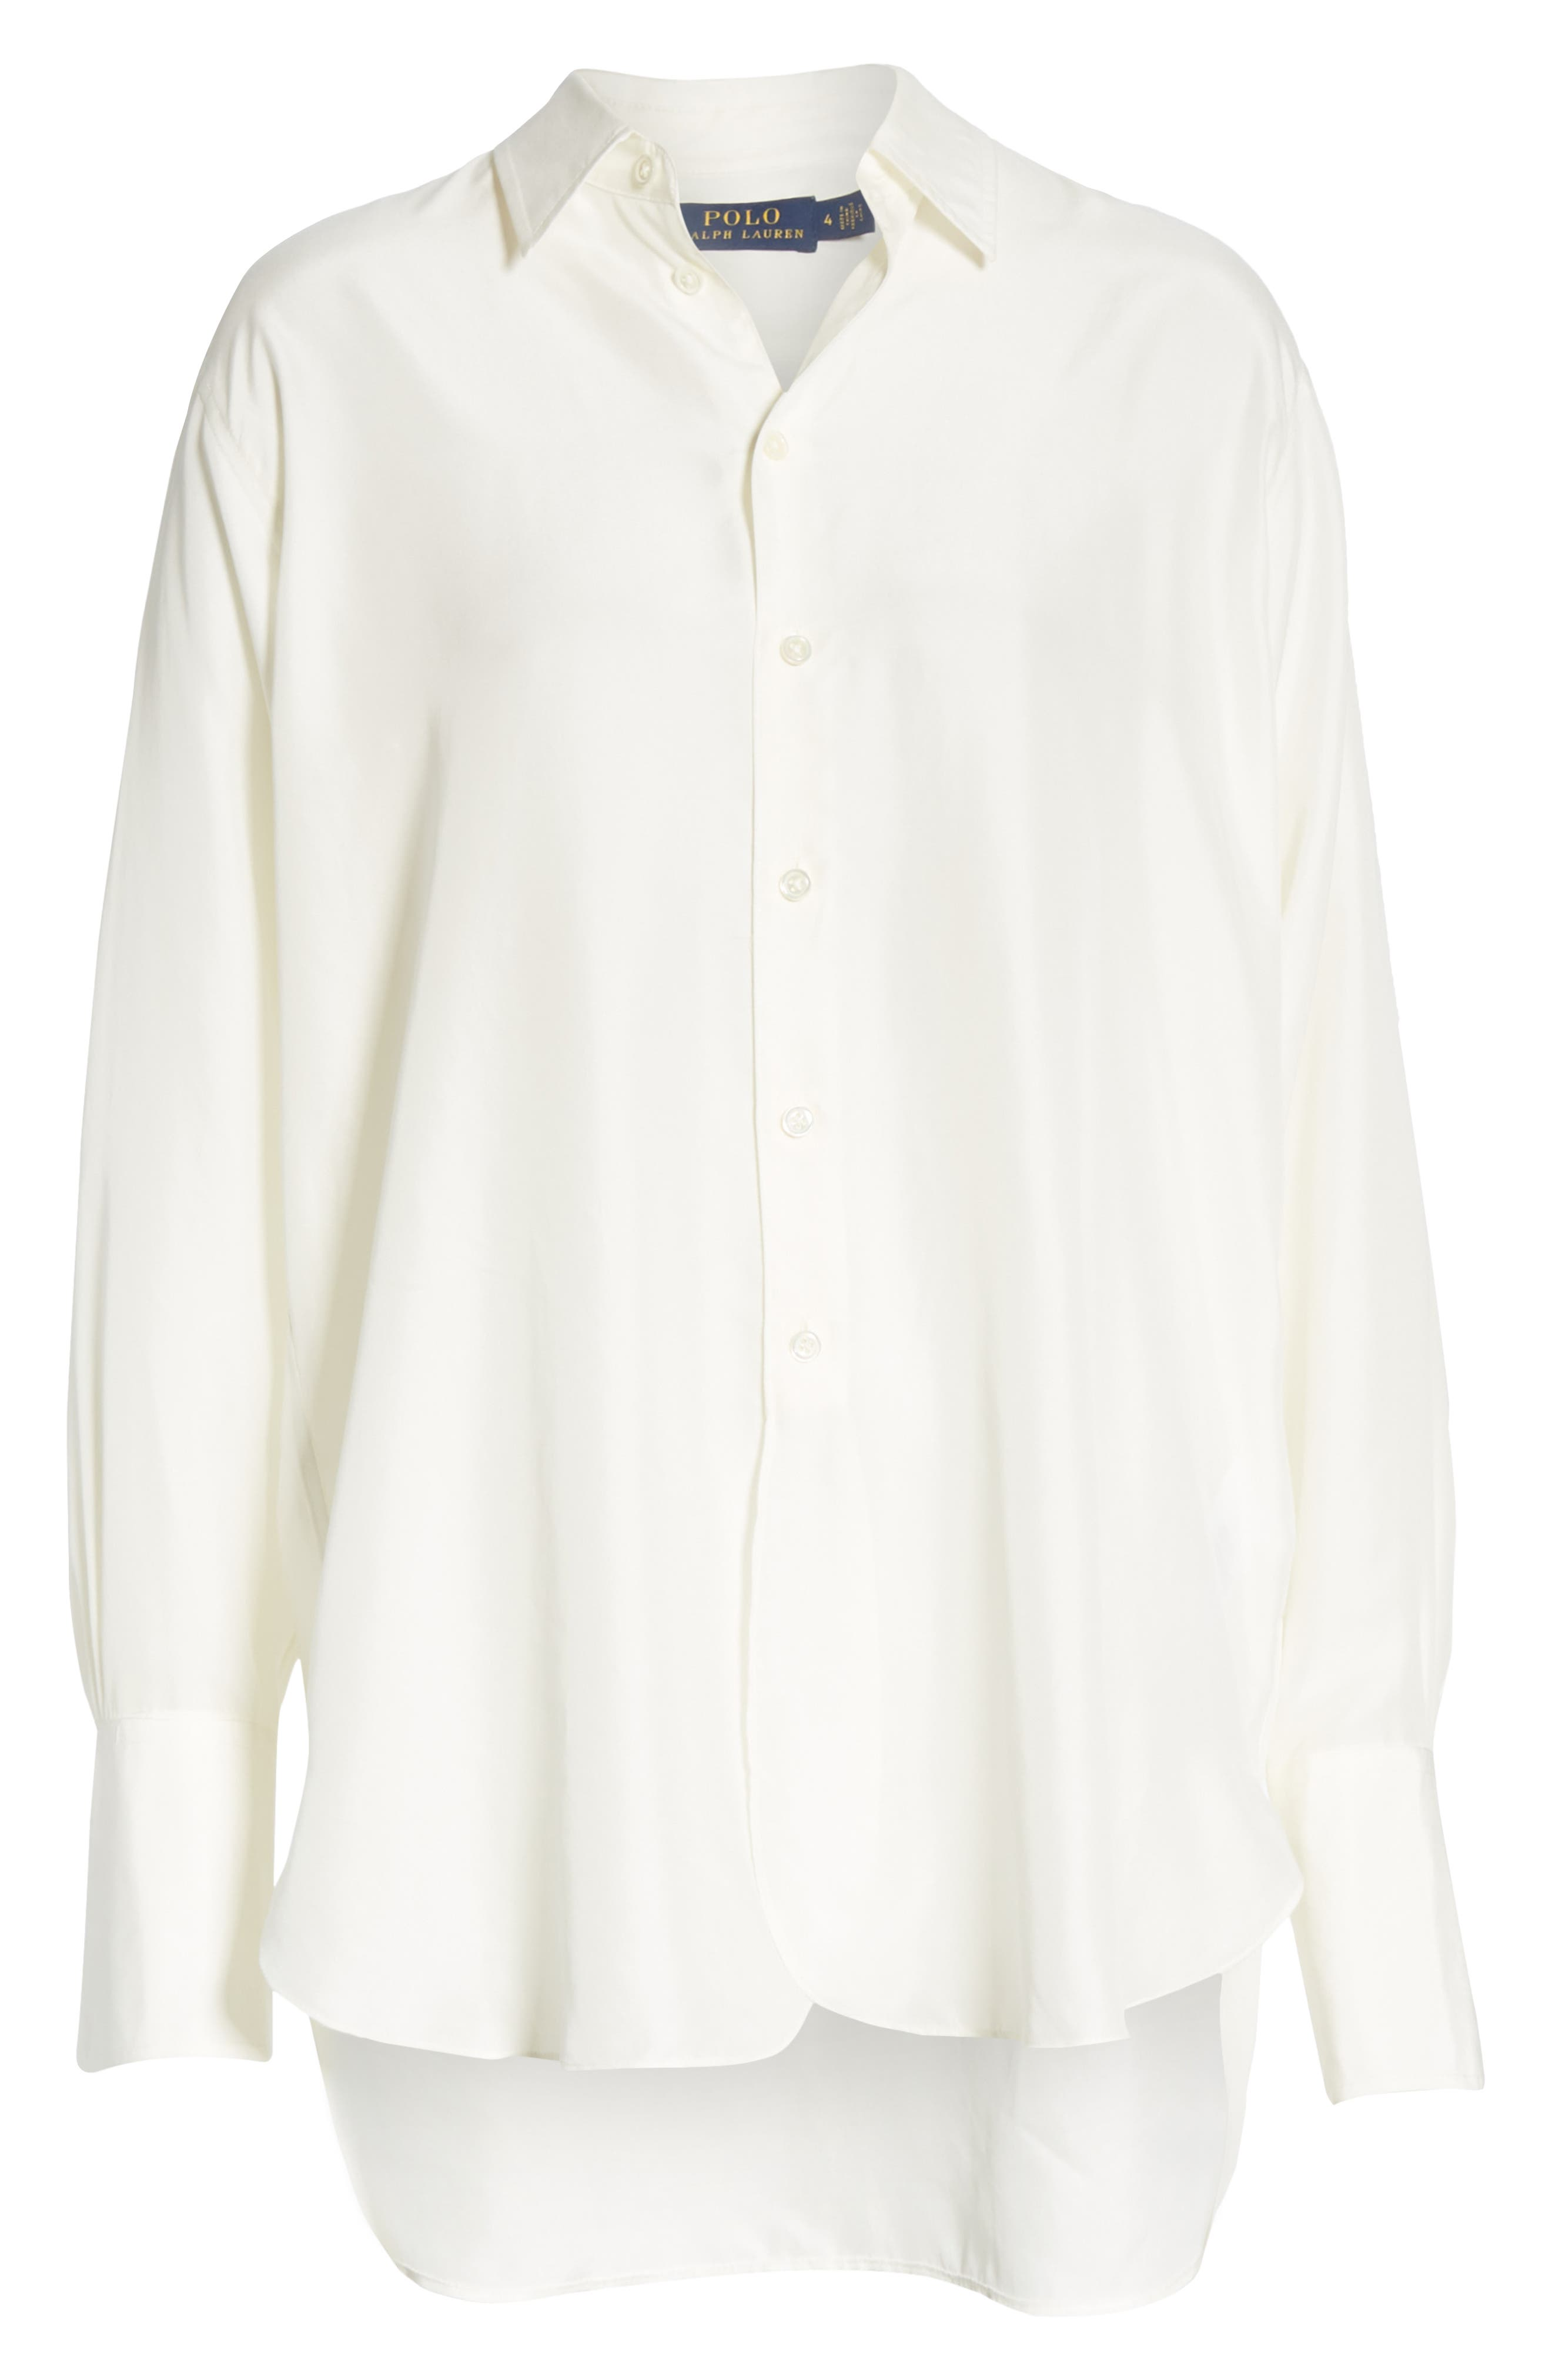 POLO RALPH LAUREN,                             High/Low Silk Shirt,                             Alternate thumbnail 6, color,                             100